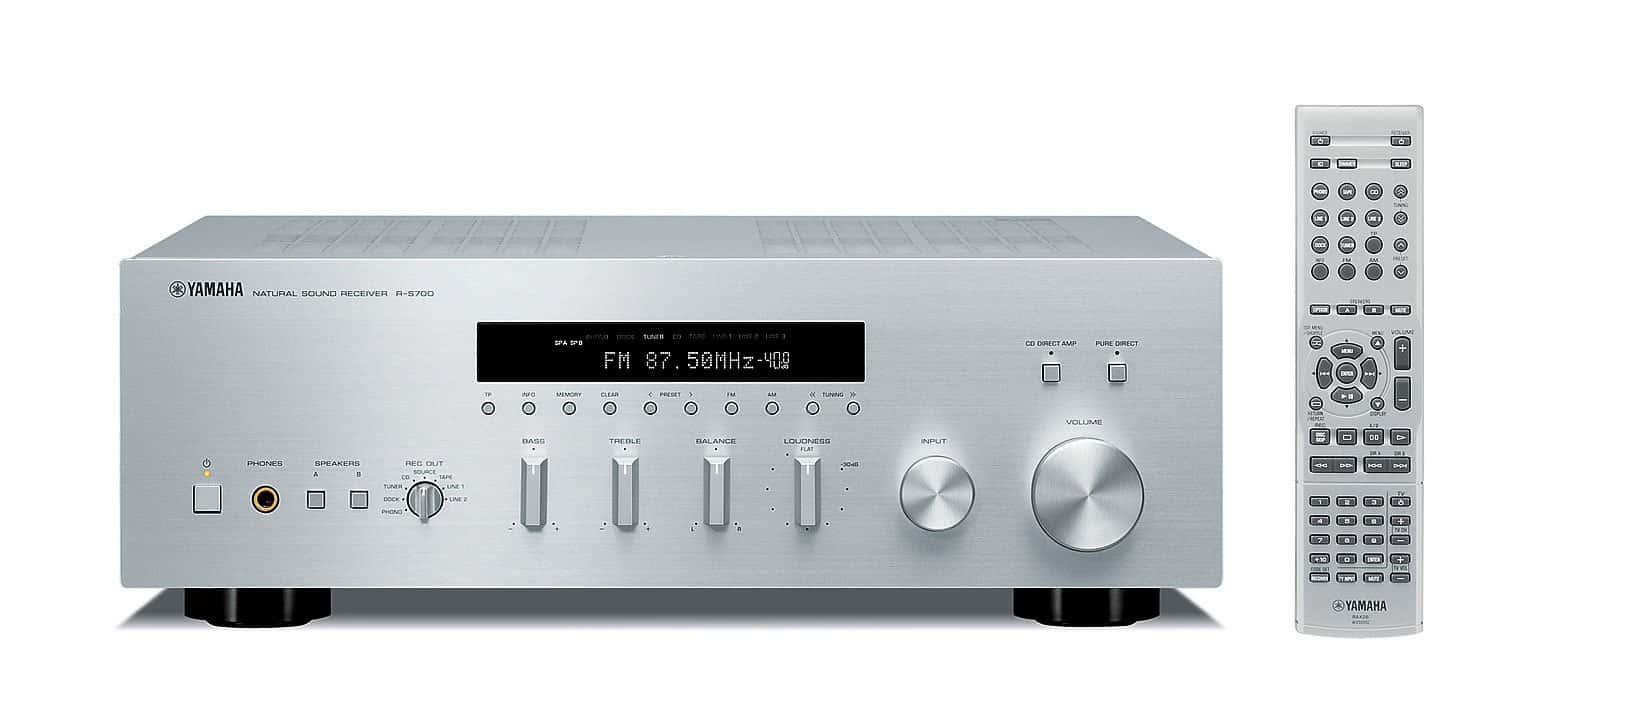 Yamaha r s700 heimkinopartner for Yamaha r s700 receiver